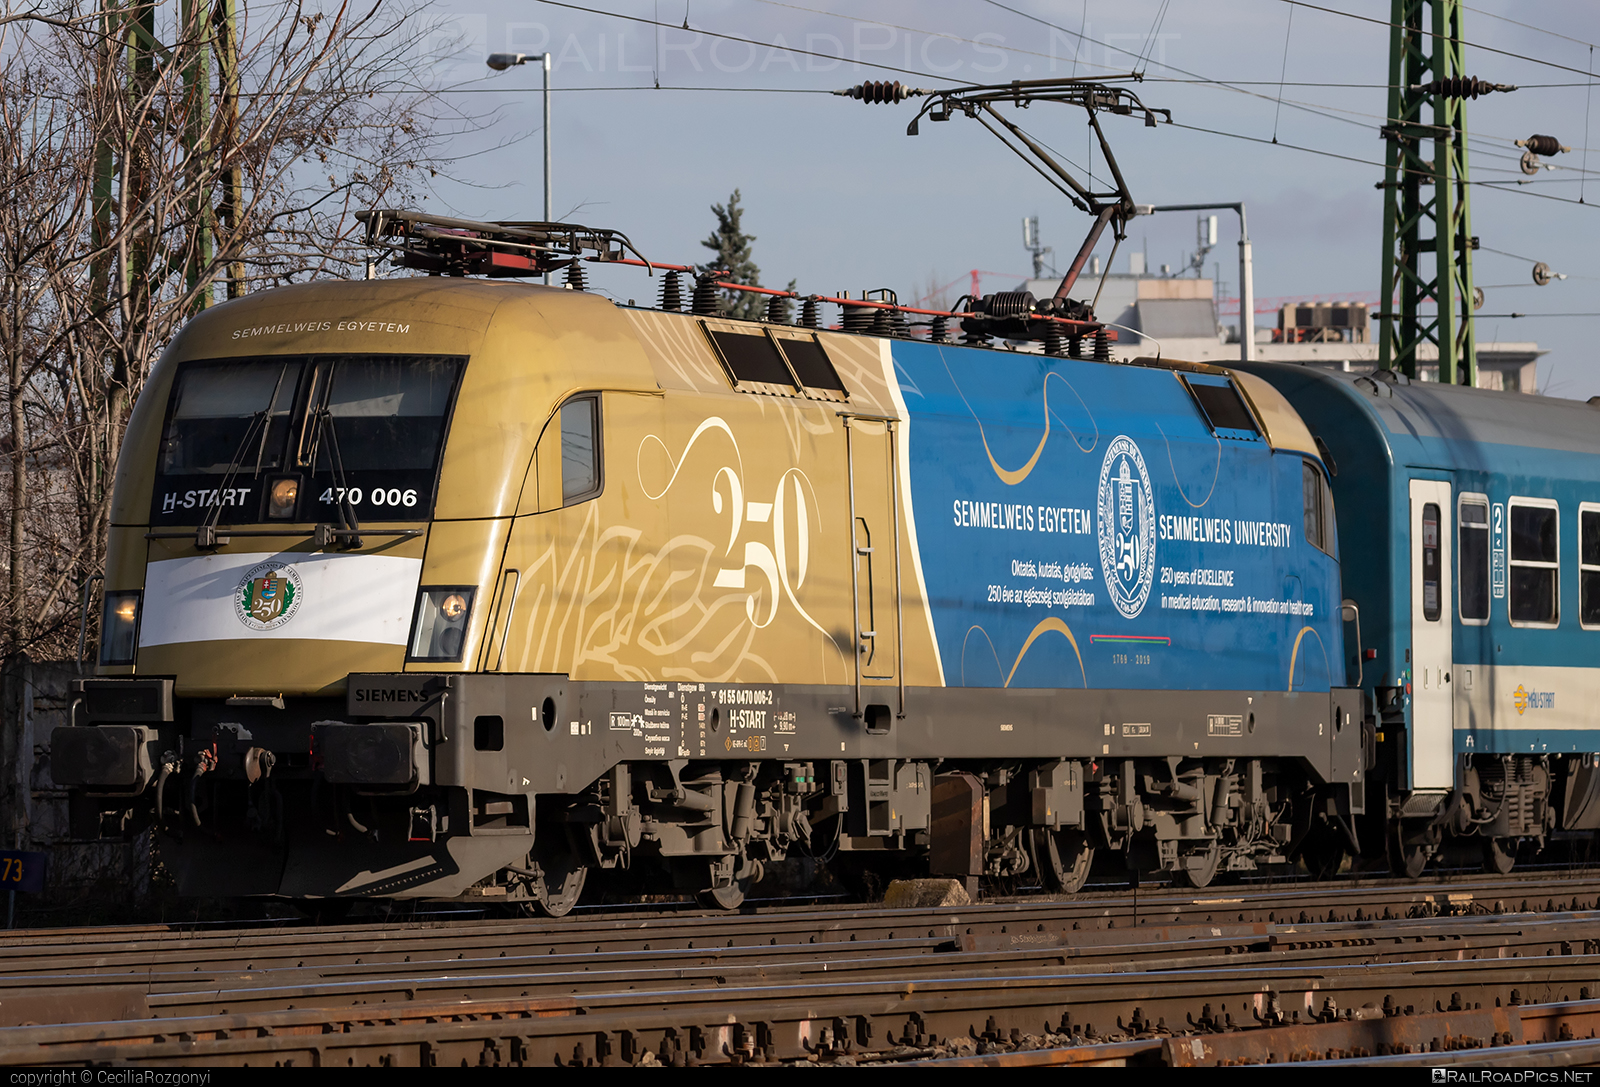 Siemens ES 64 U2 - 470 006 operated by MÁV-START ZRt. #es64 #es64u #es64u2 #eurosprinter #mav #mavstart #mavstartzrt #siemens #siemenses64 #siemenses64u #siemenses64u2 #siemenstaurus #taurus #tauruslocomotive